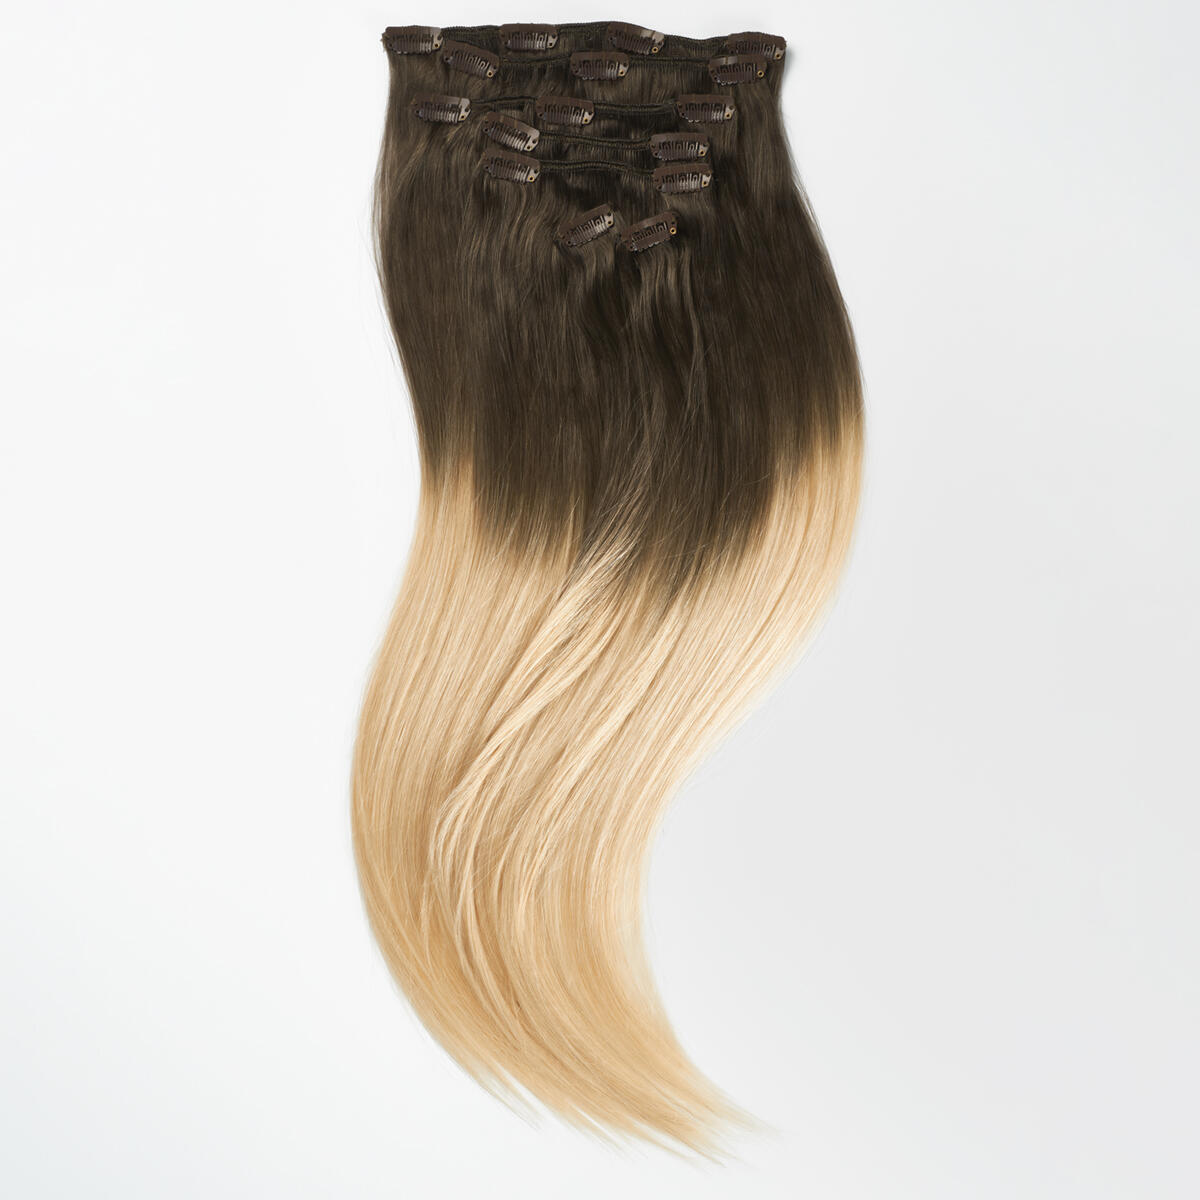 Clip-on set O2.6/8.0 Dark Ash Blond Ombre 50 cm